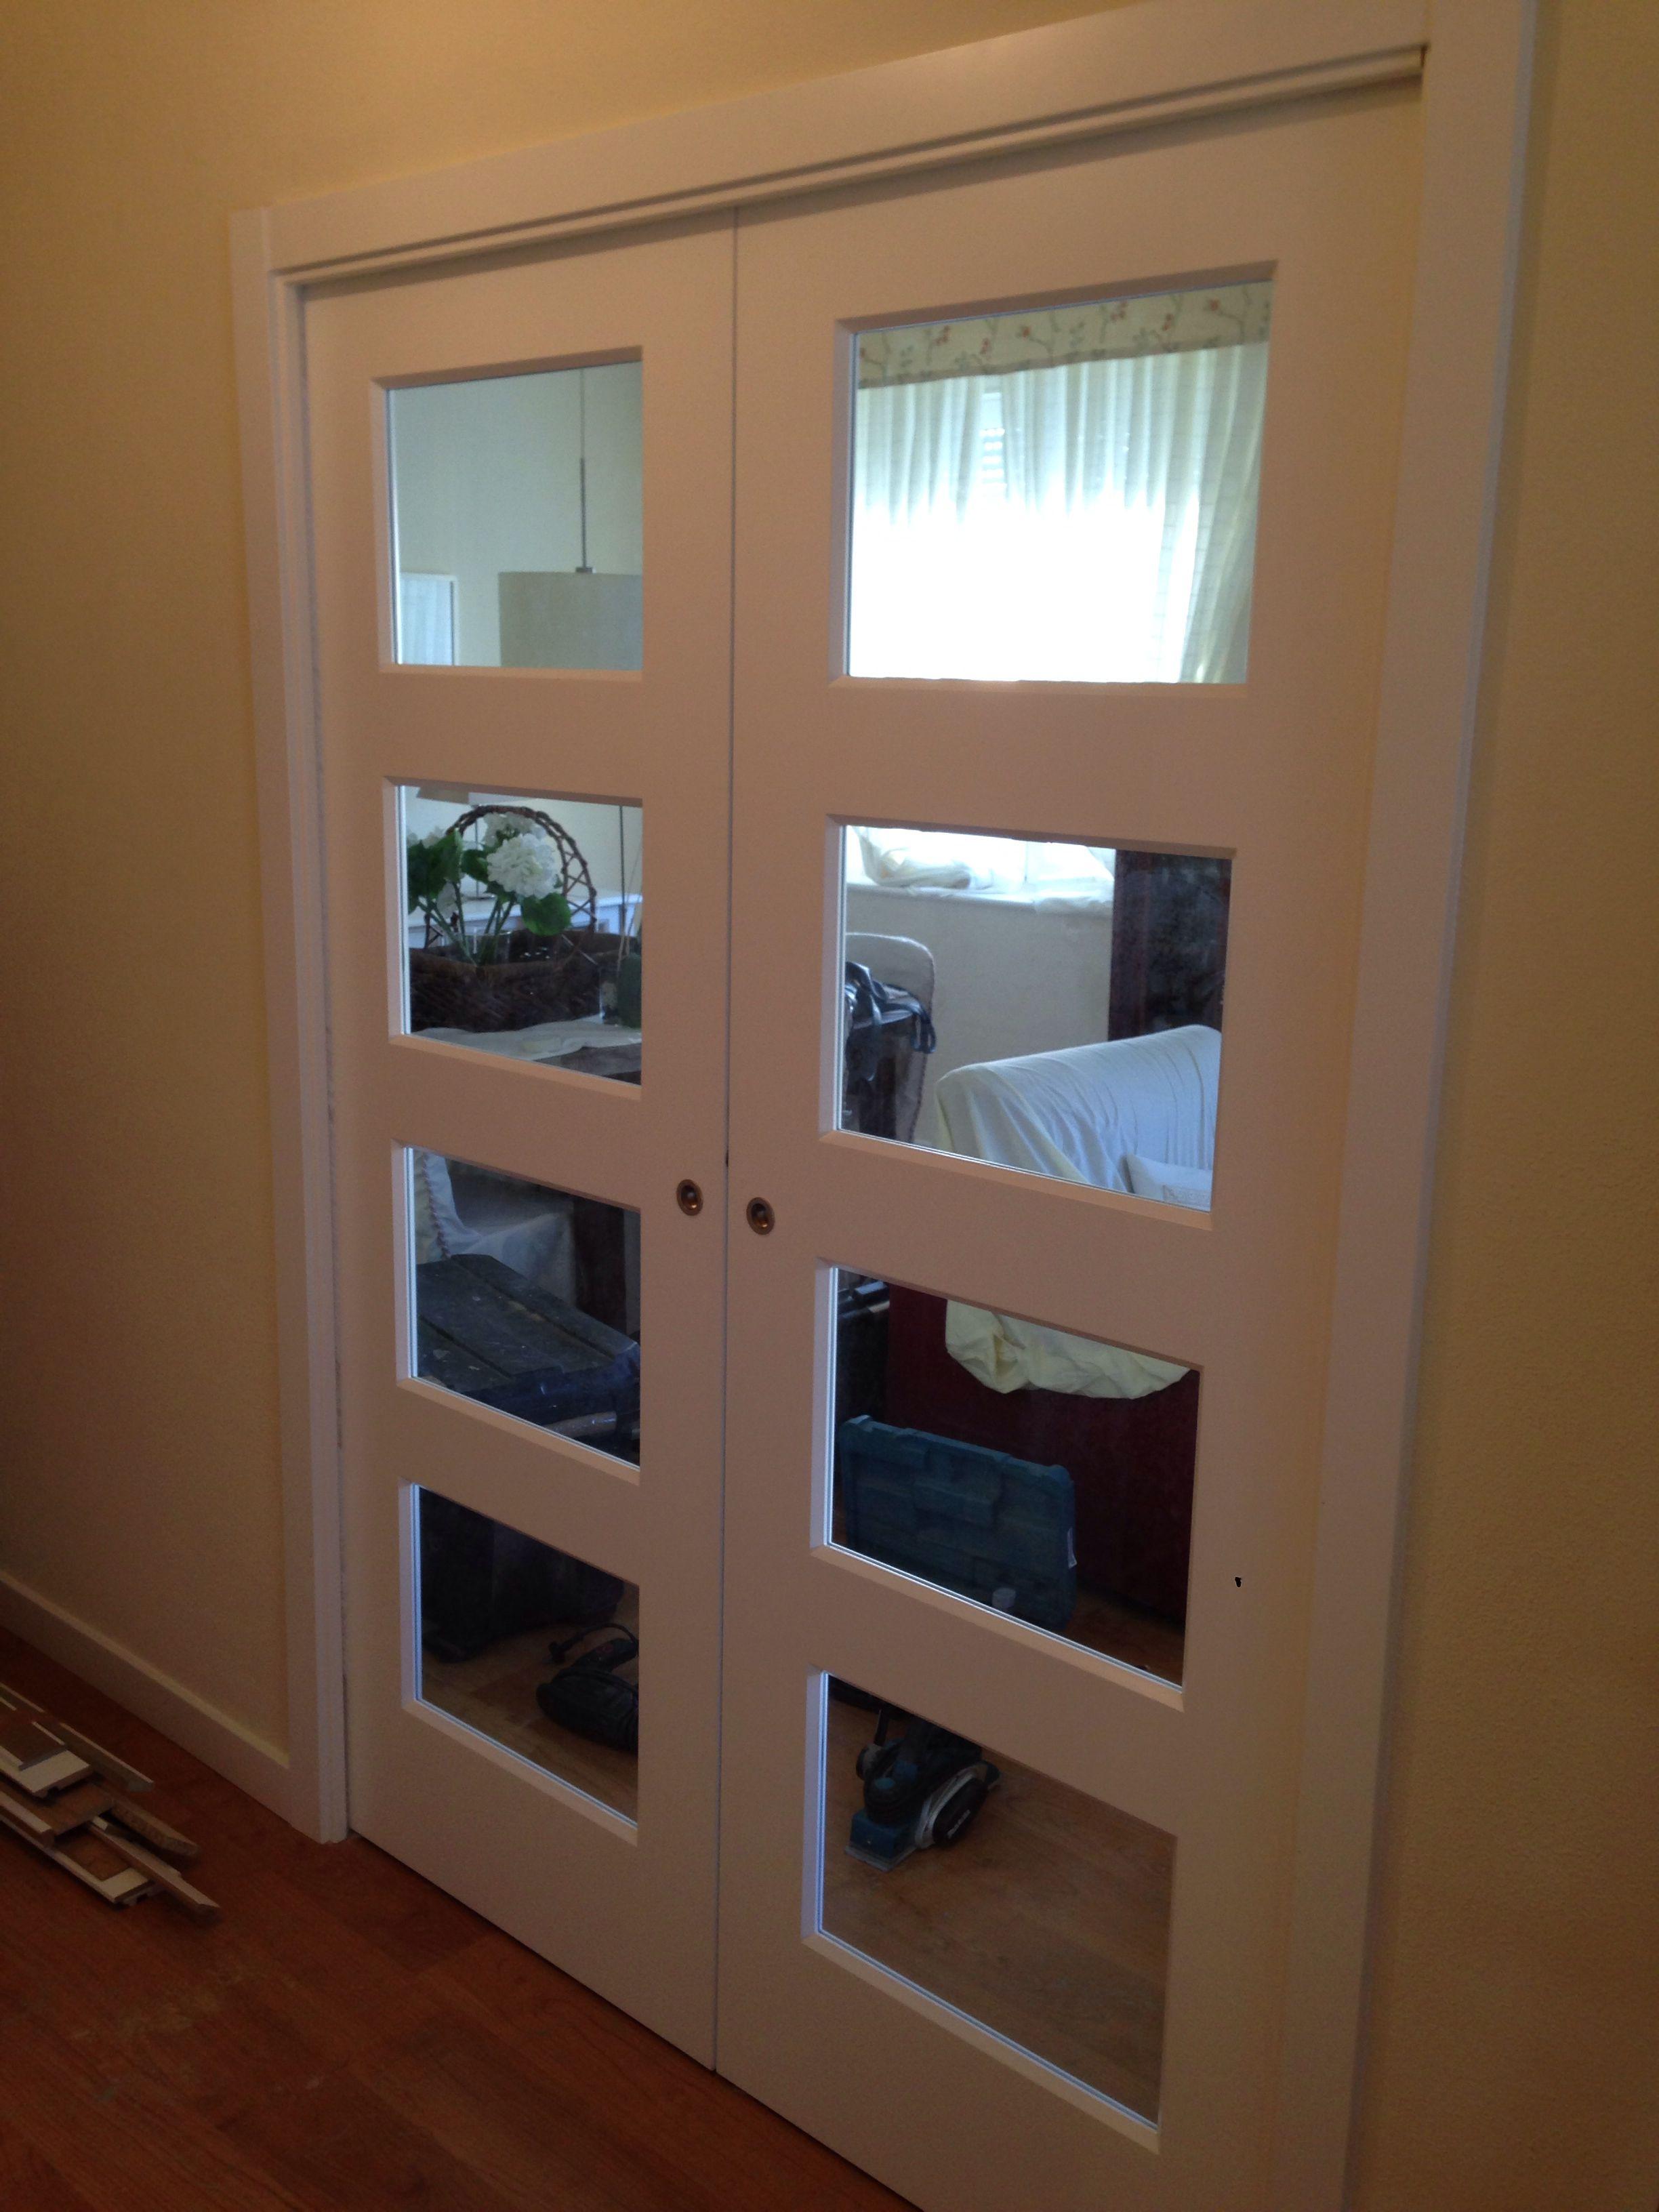 400 Ps V4 Con Cristal Transparente En Corredera Puertas Correderas Madera Puertas Lacadas Puertas De Aluminio